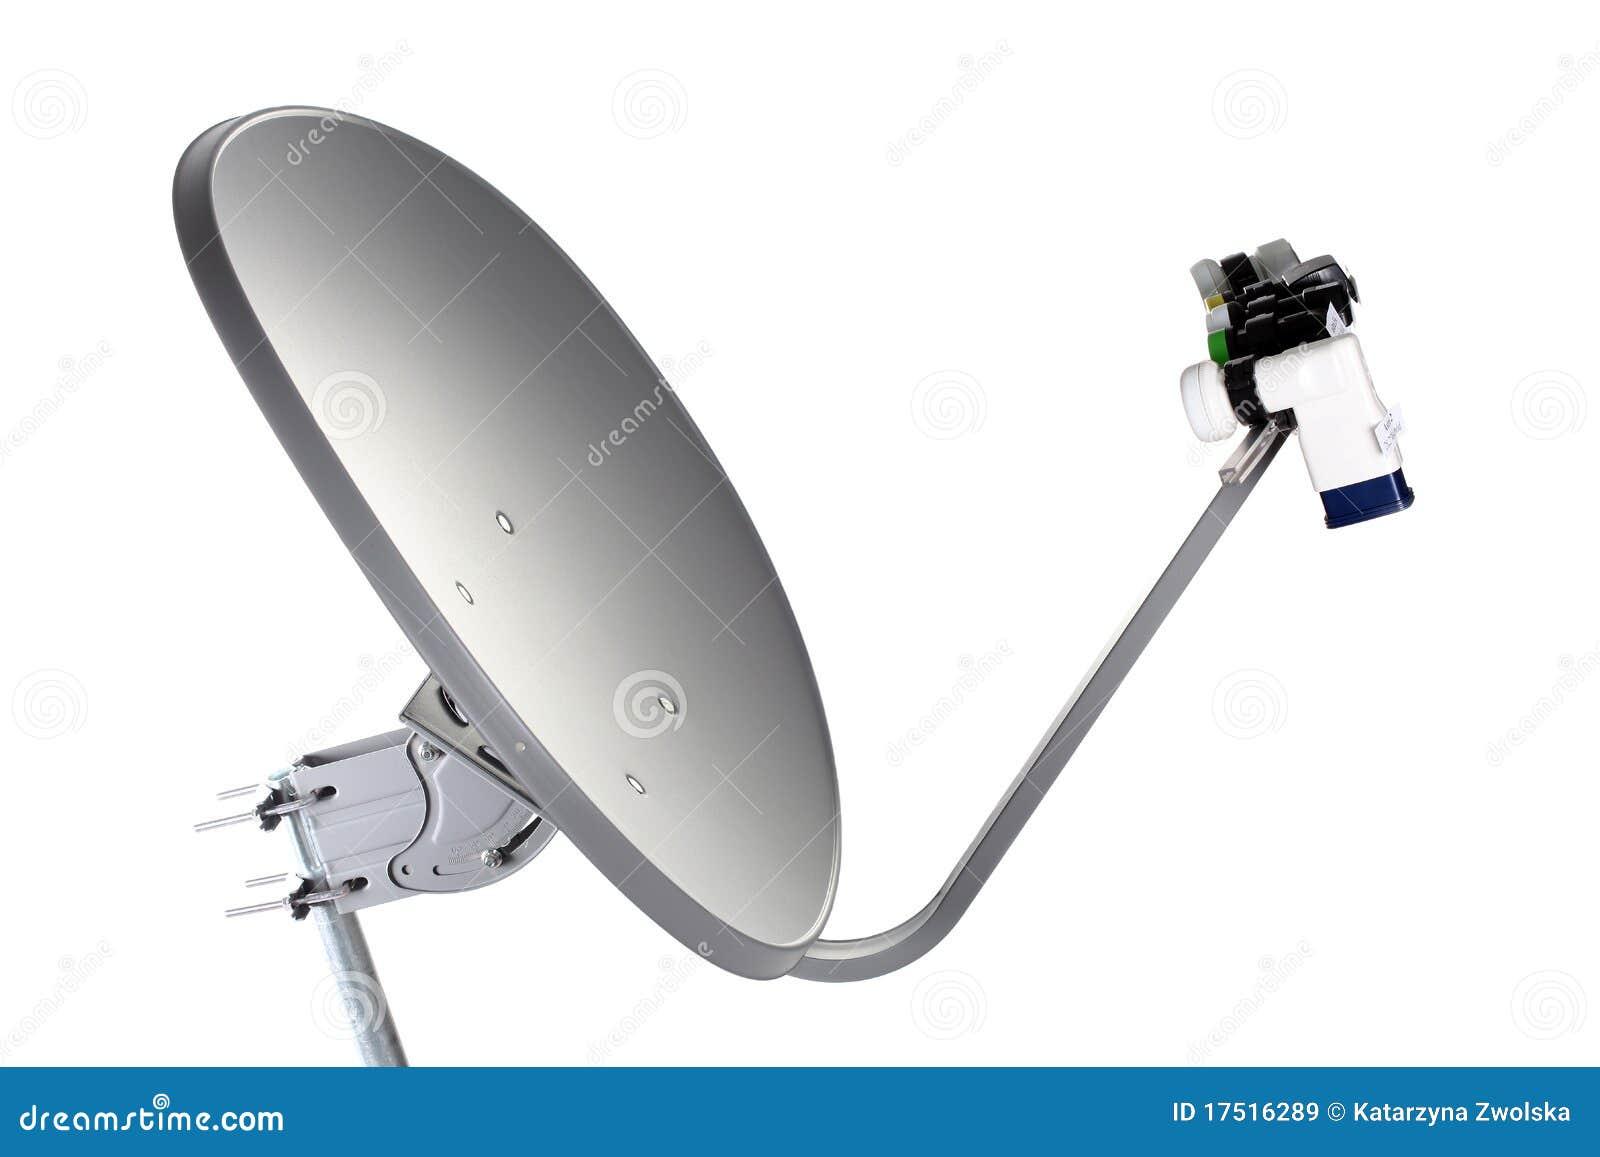 Download Satellite Dish Receiver stock image. Image of communication - 17516289